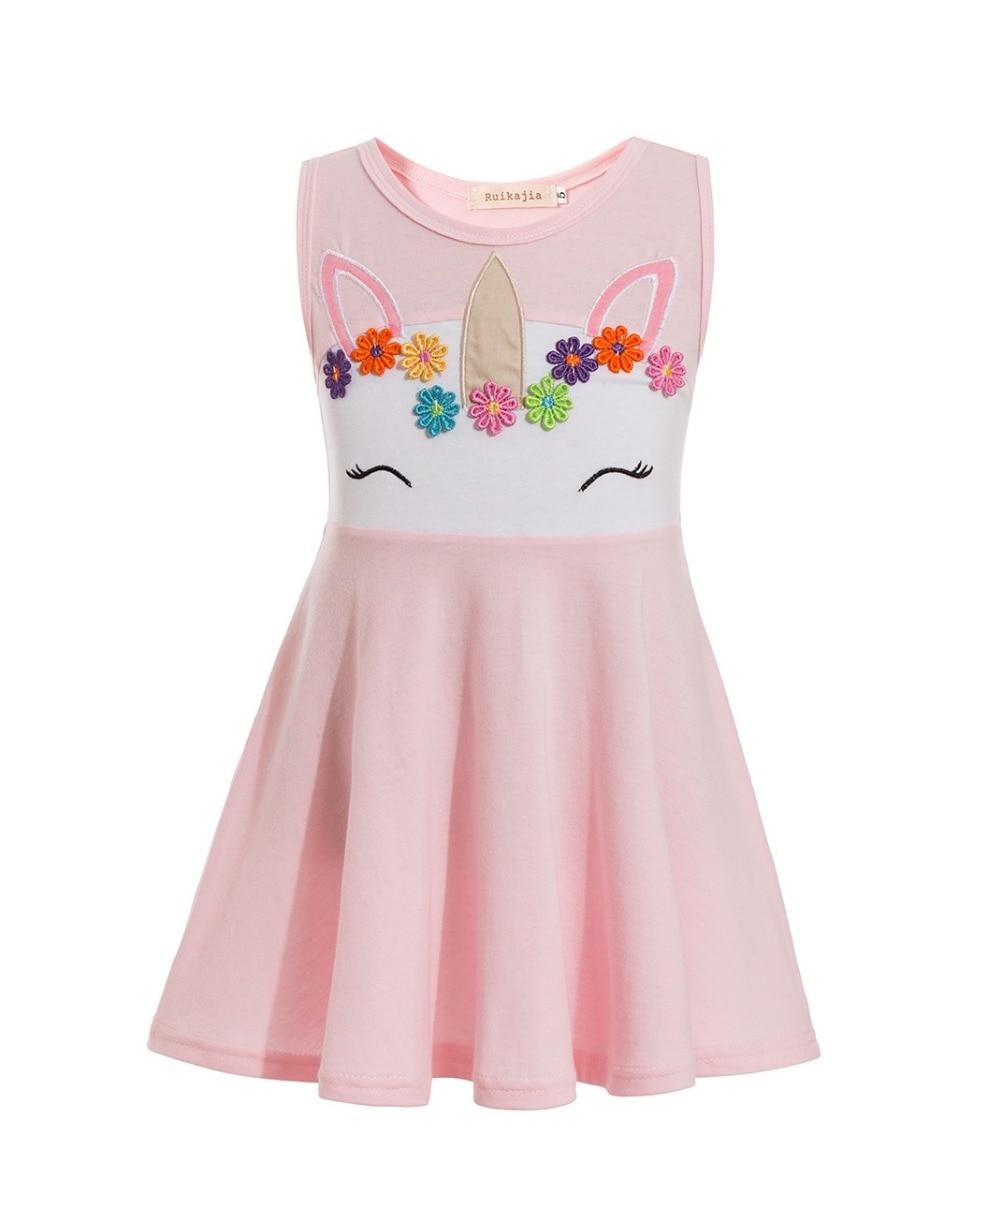 1eb8f4c8c9728 top 10 children dress masha and bear list and get free shipping ...